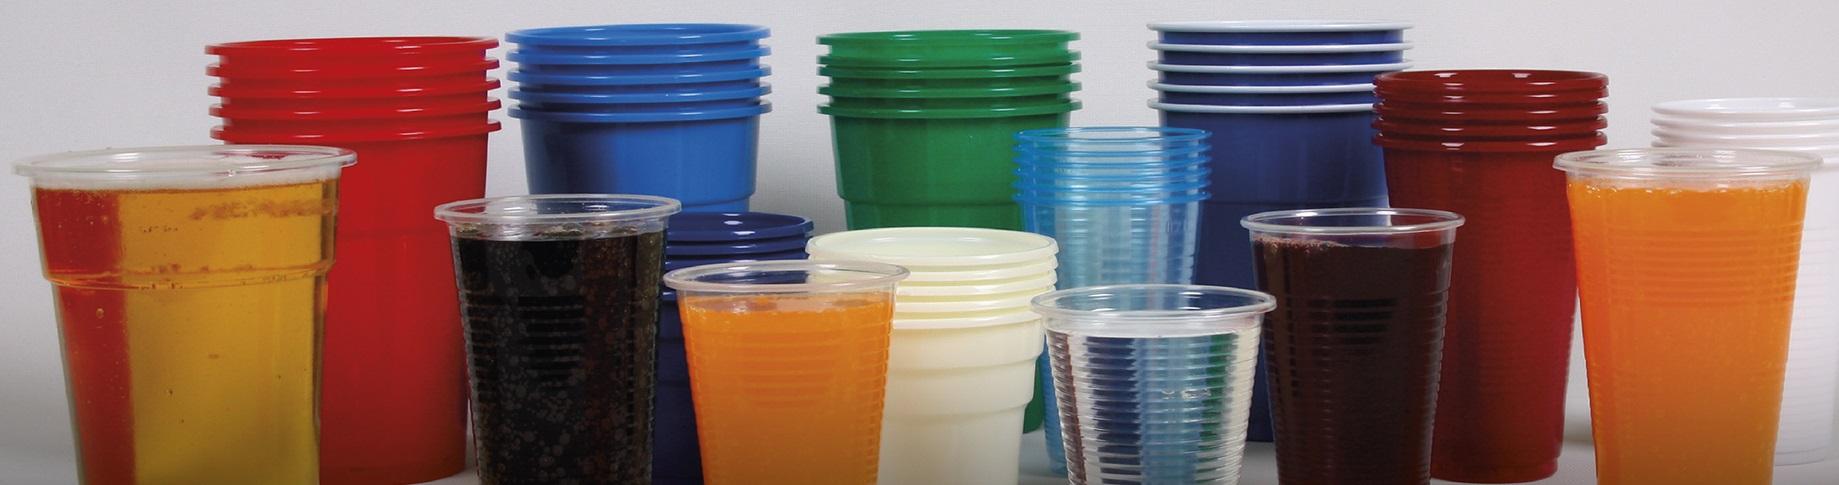 تولید لیوان یکبارمصرف pp